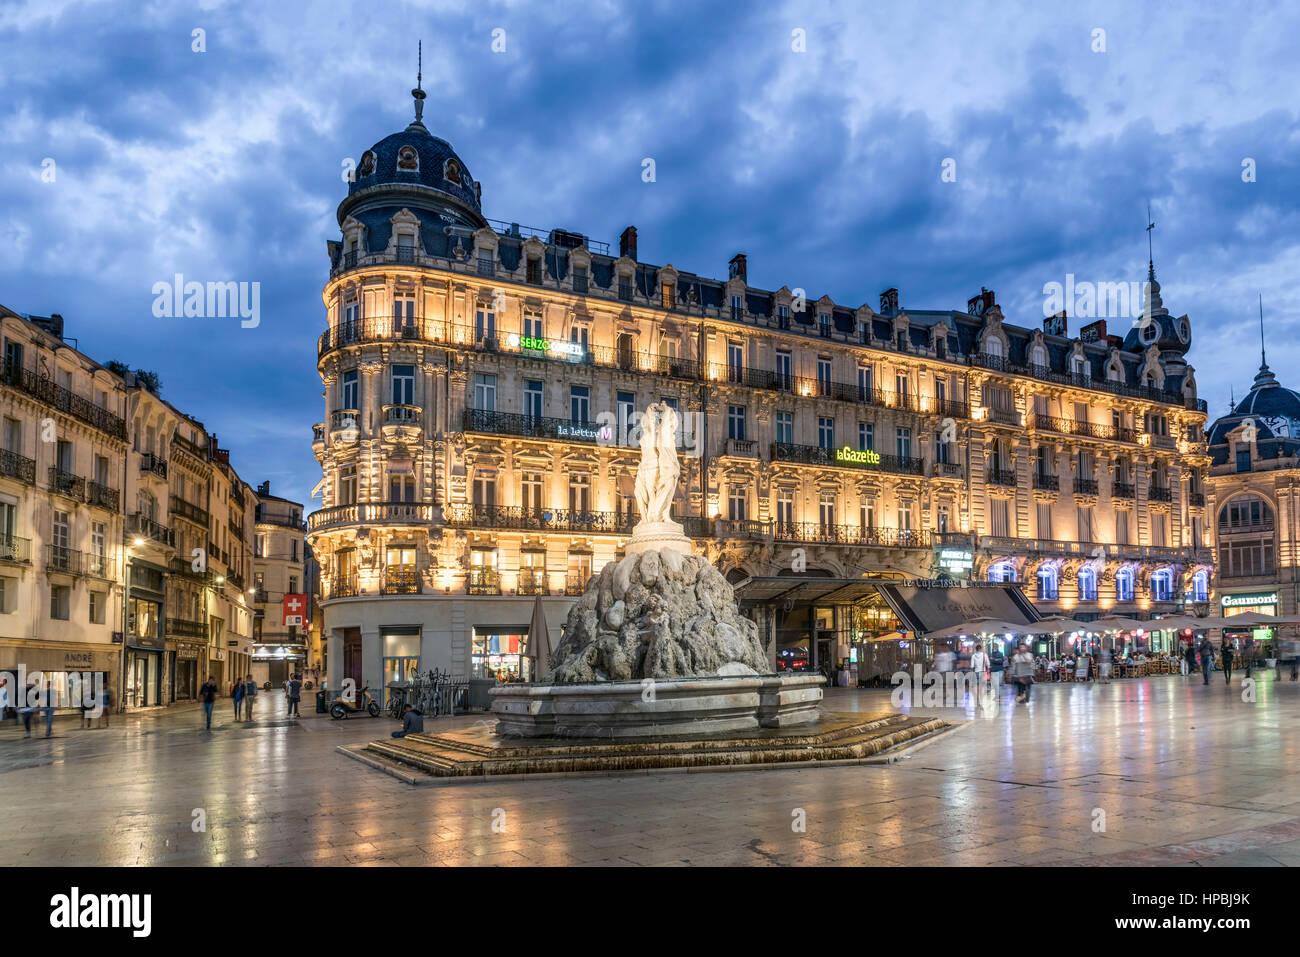 Place de la Comedie, Three graces fountain, Montpellier, France, - Stock Image